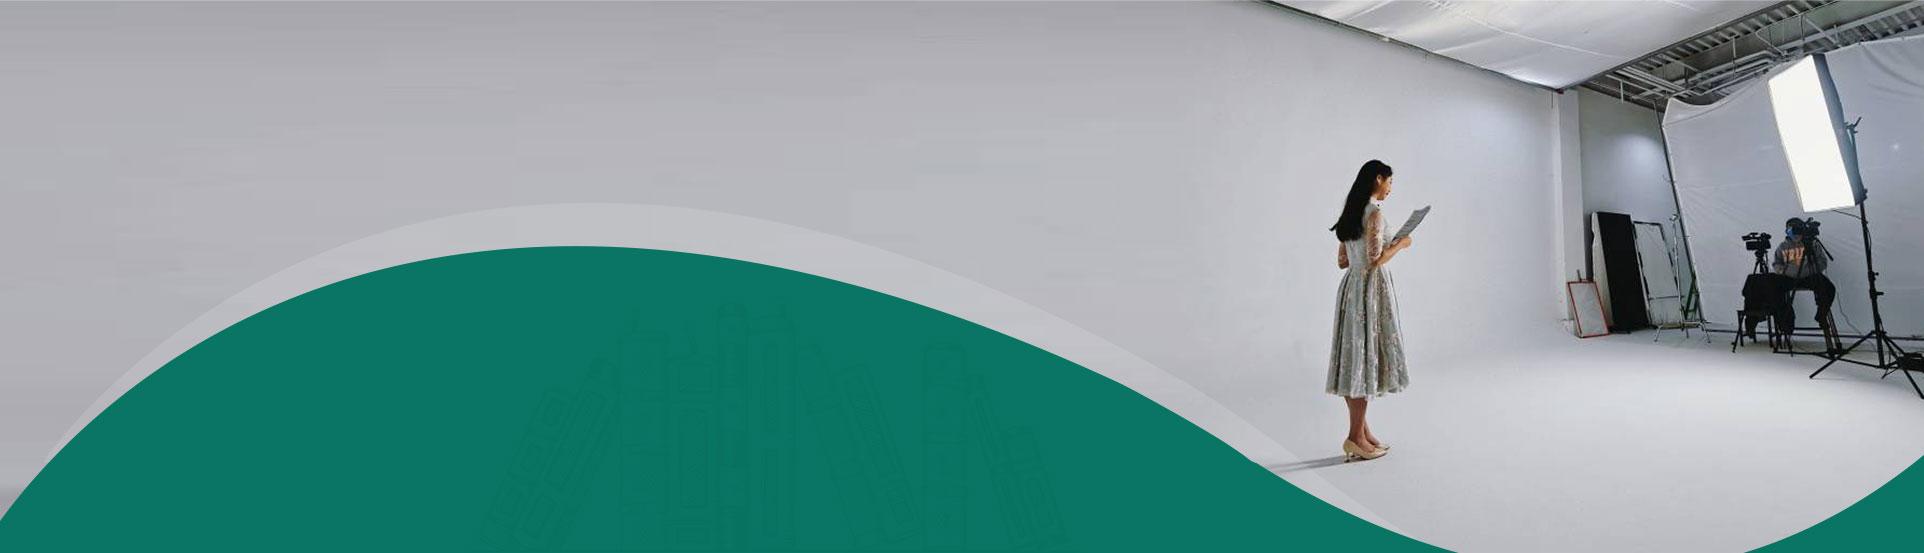 教育教学banner